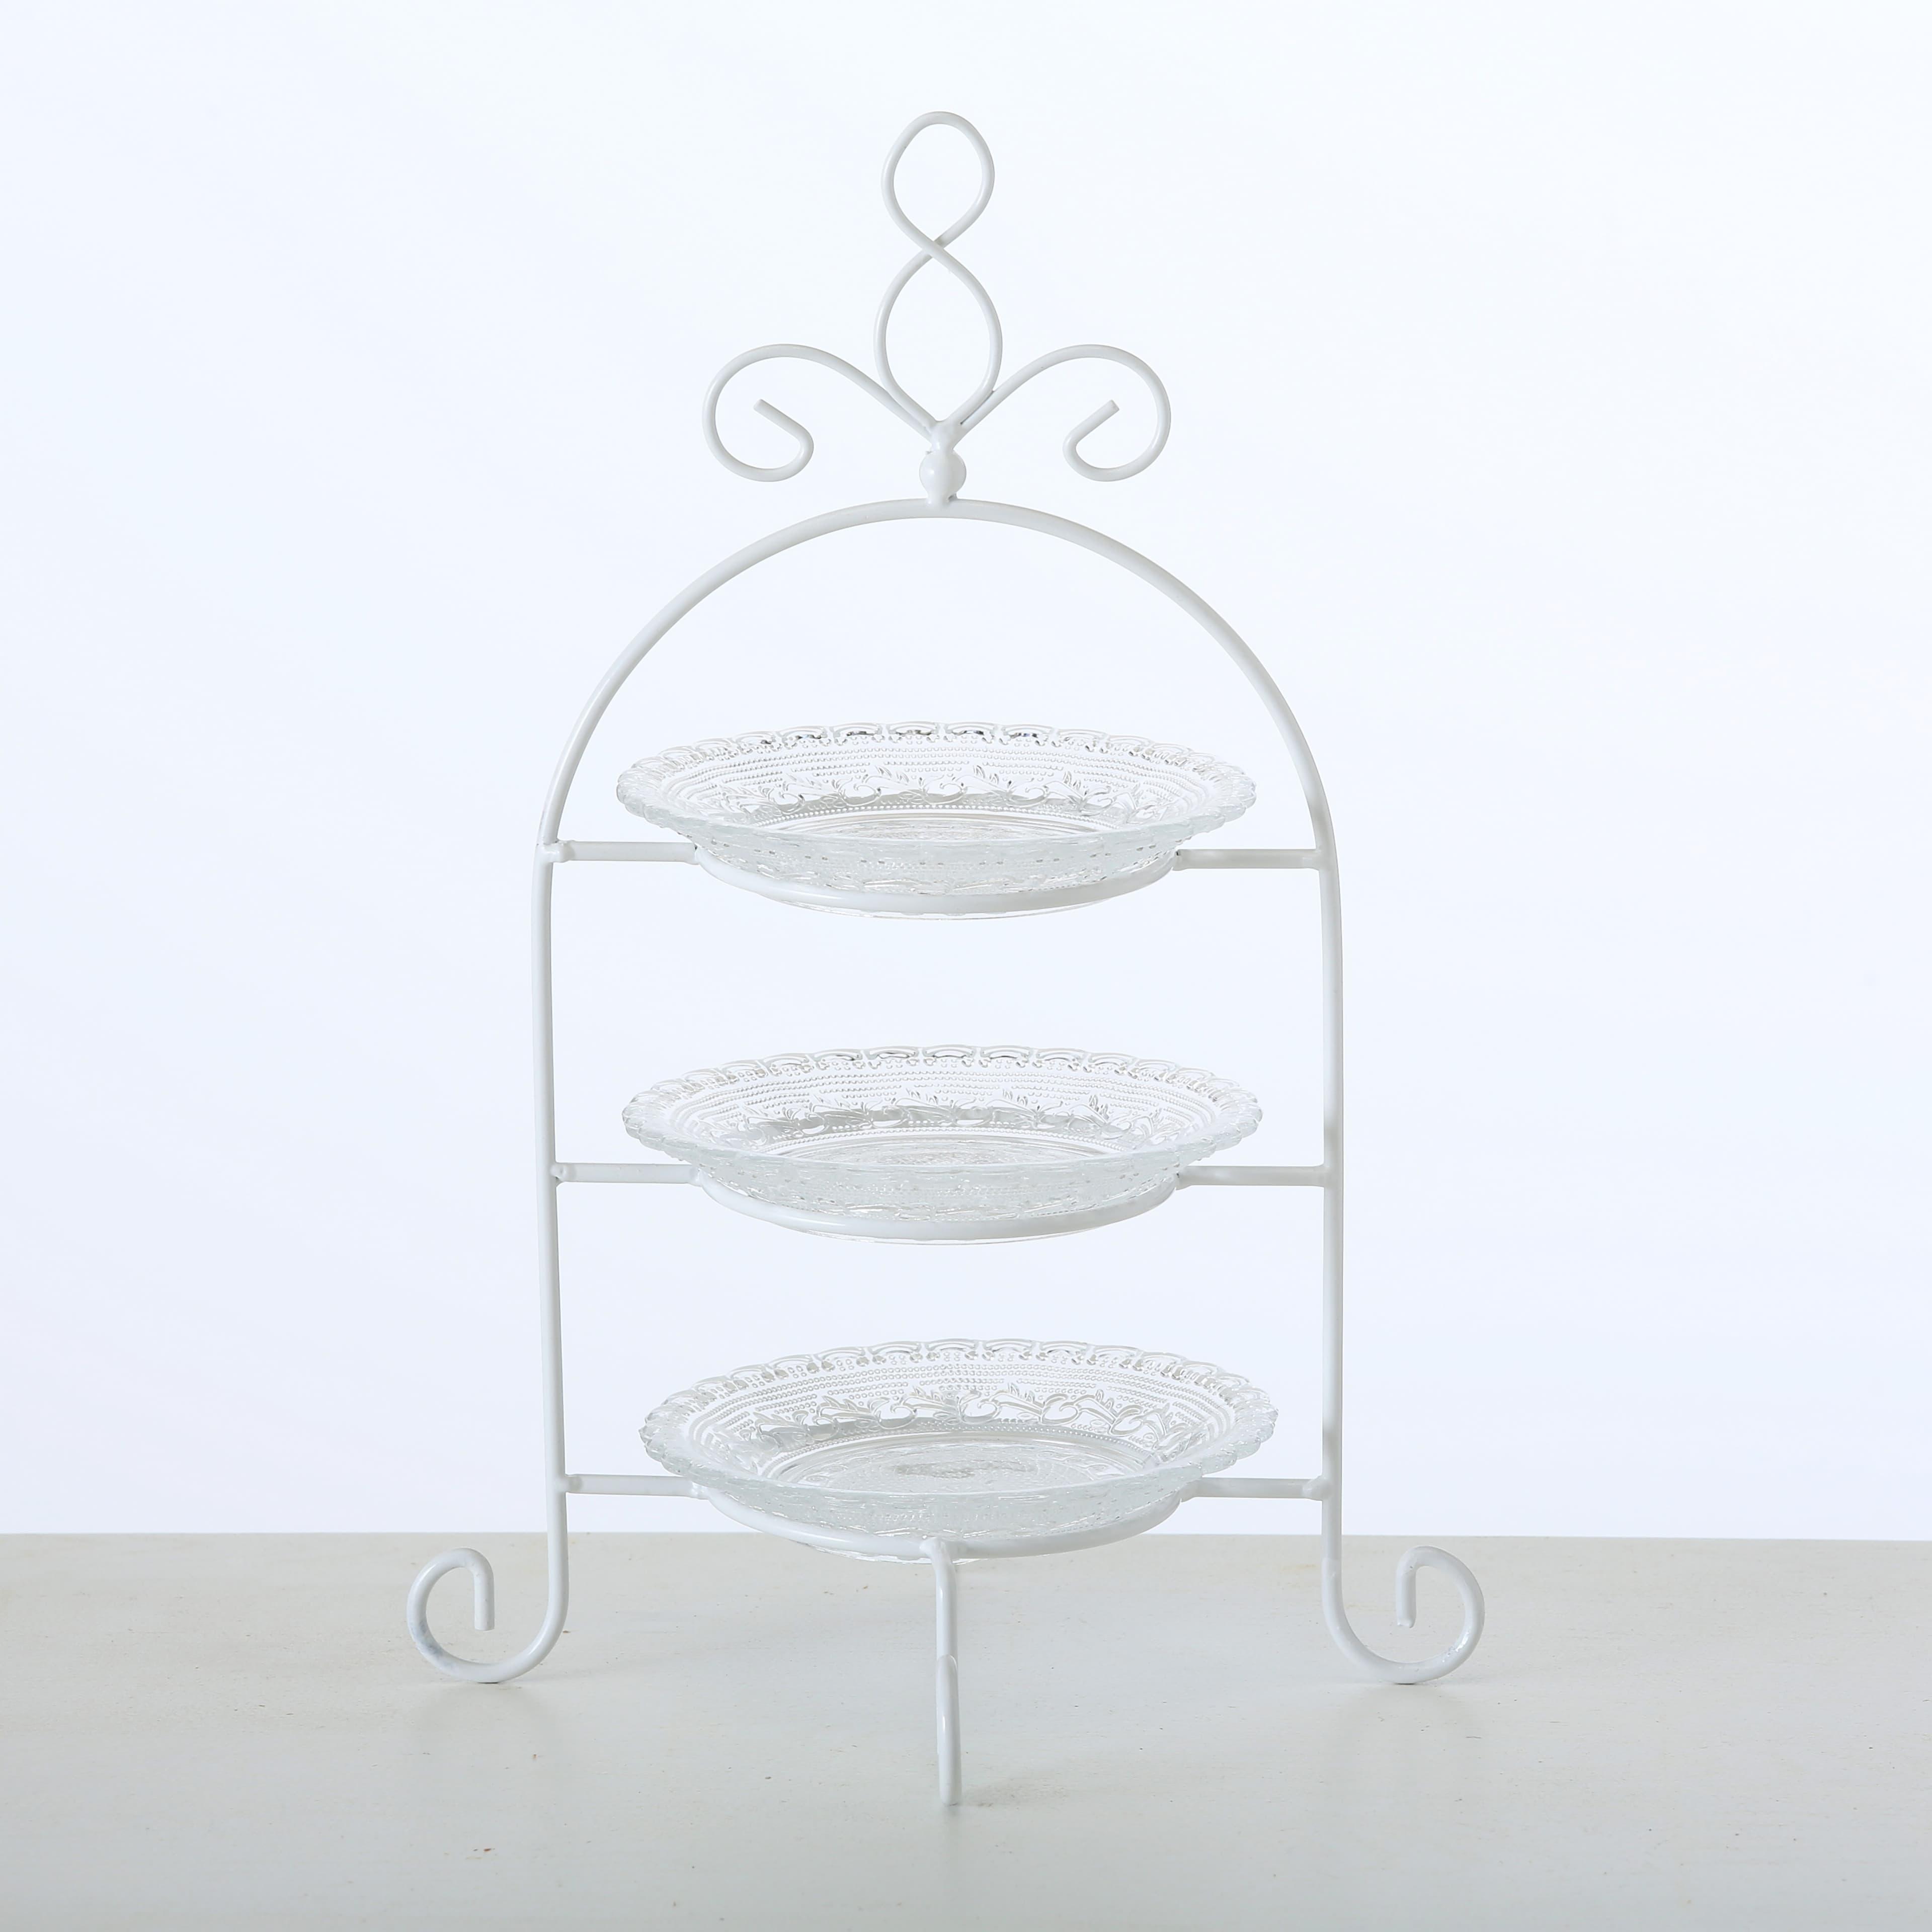 Suport din sticla si metal pentru prajituri, pe 3 nivele Madita Alb, Ø21xH32 cm imagine